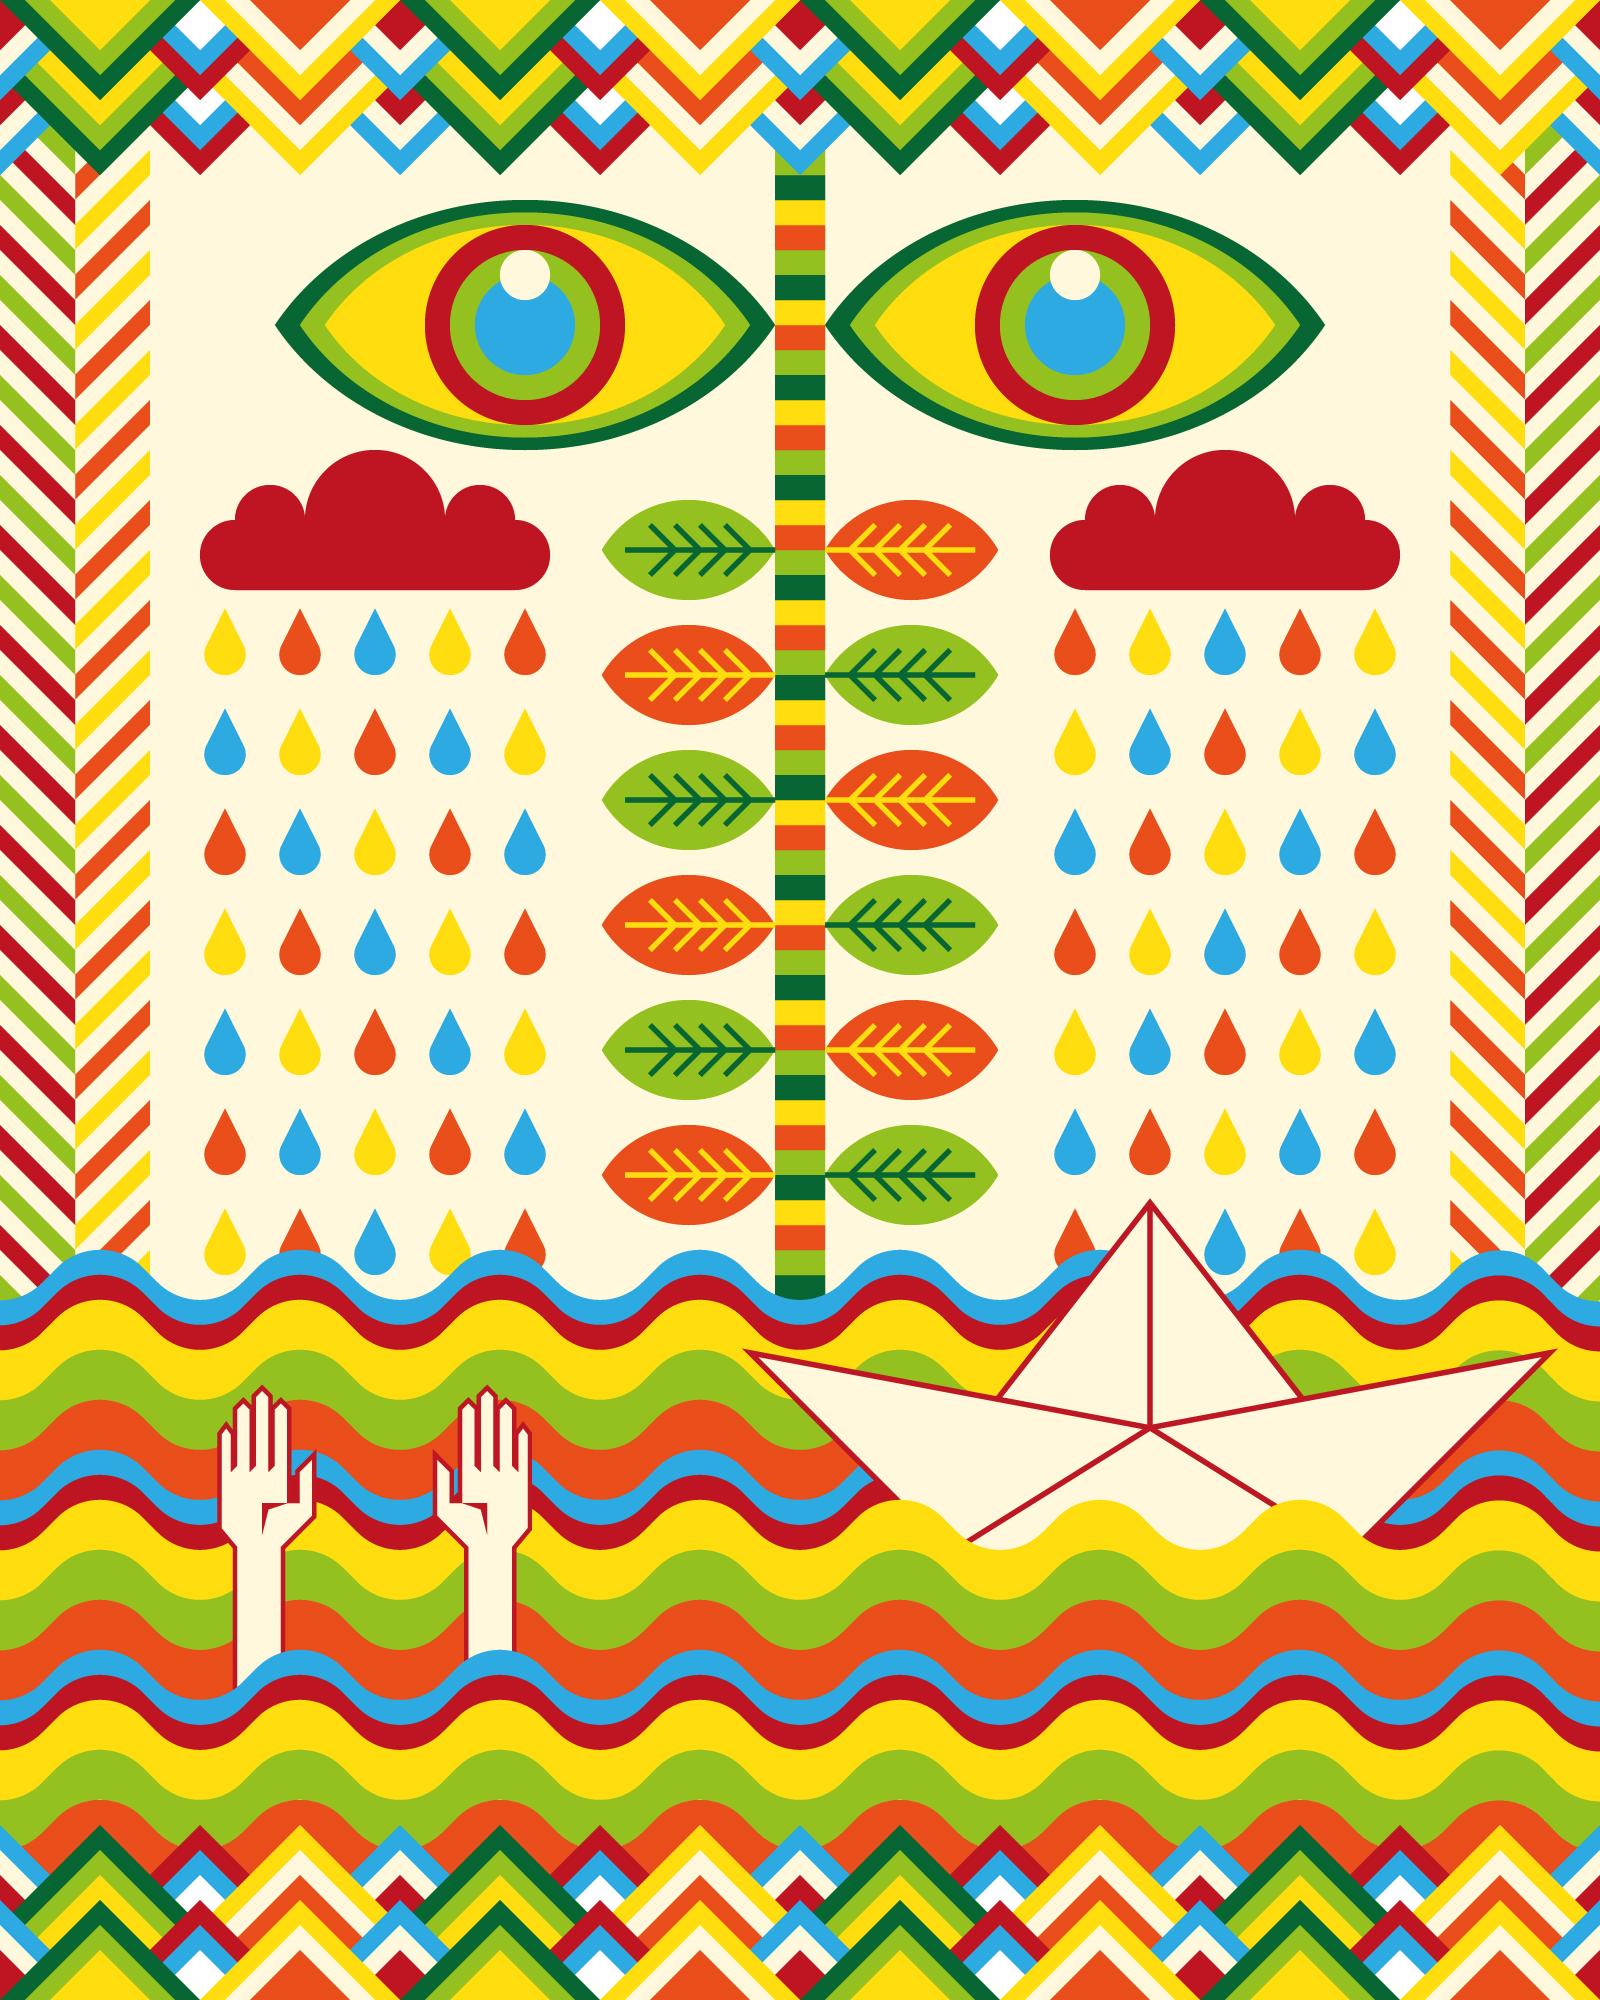 Illustration by Leopold Adi Surya